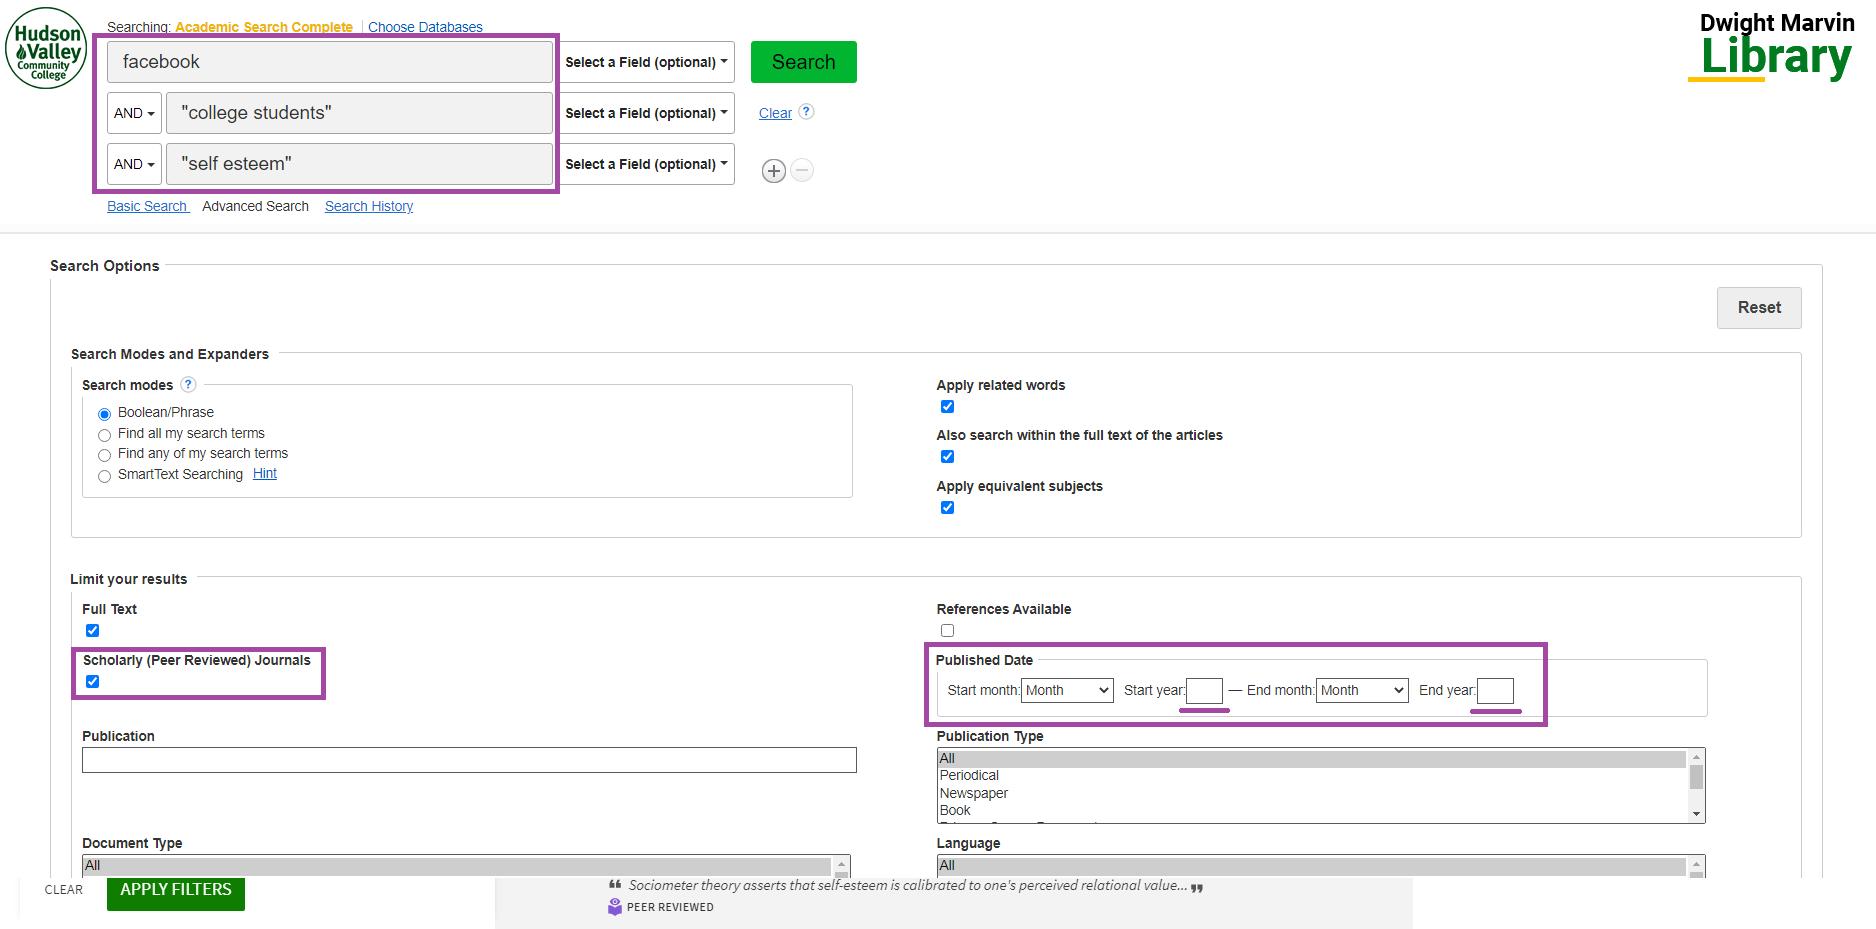 Screenshot advanced Academic Search Complete